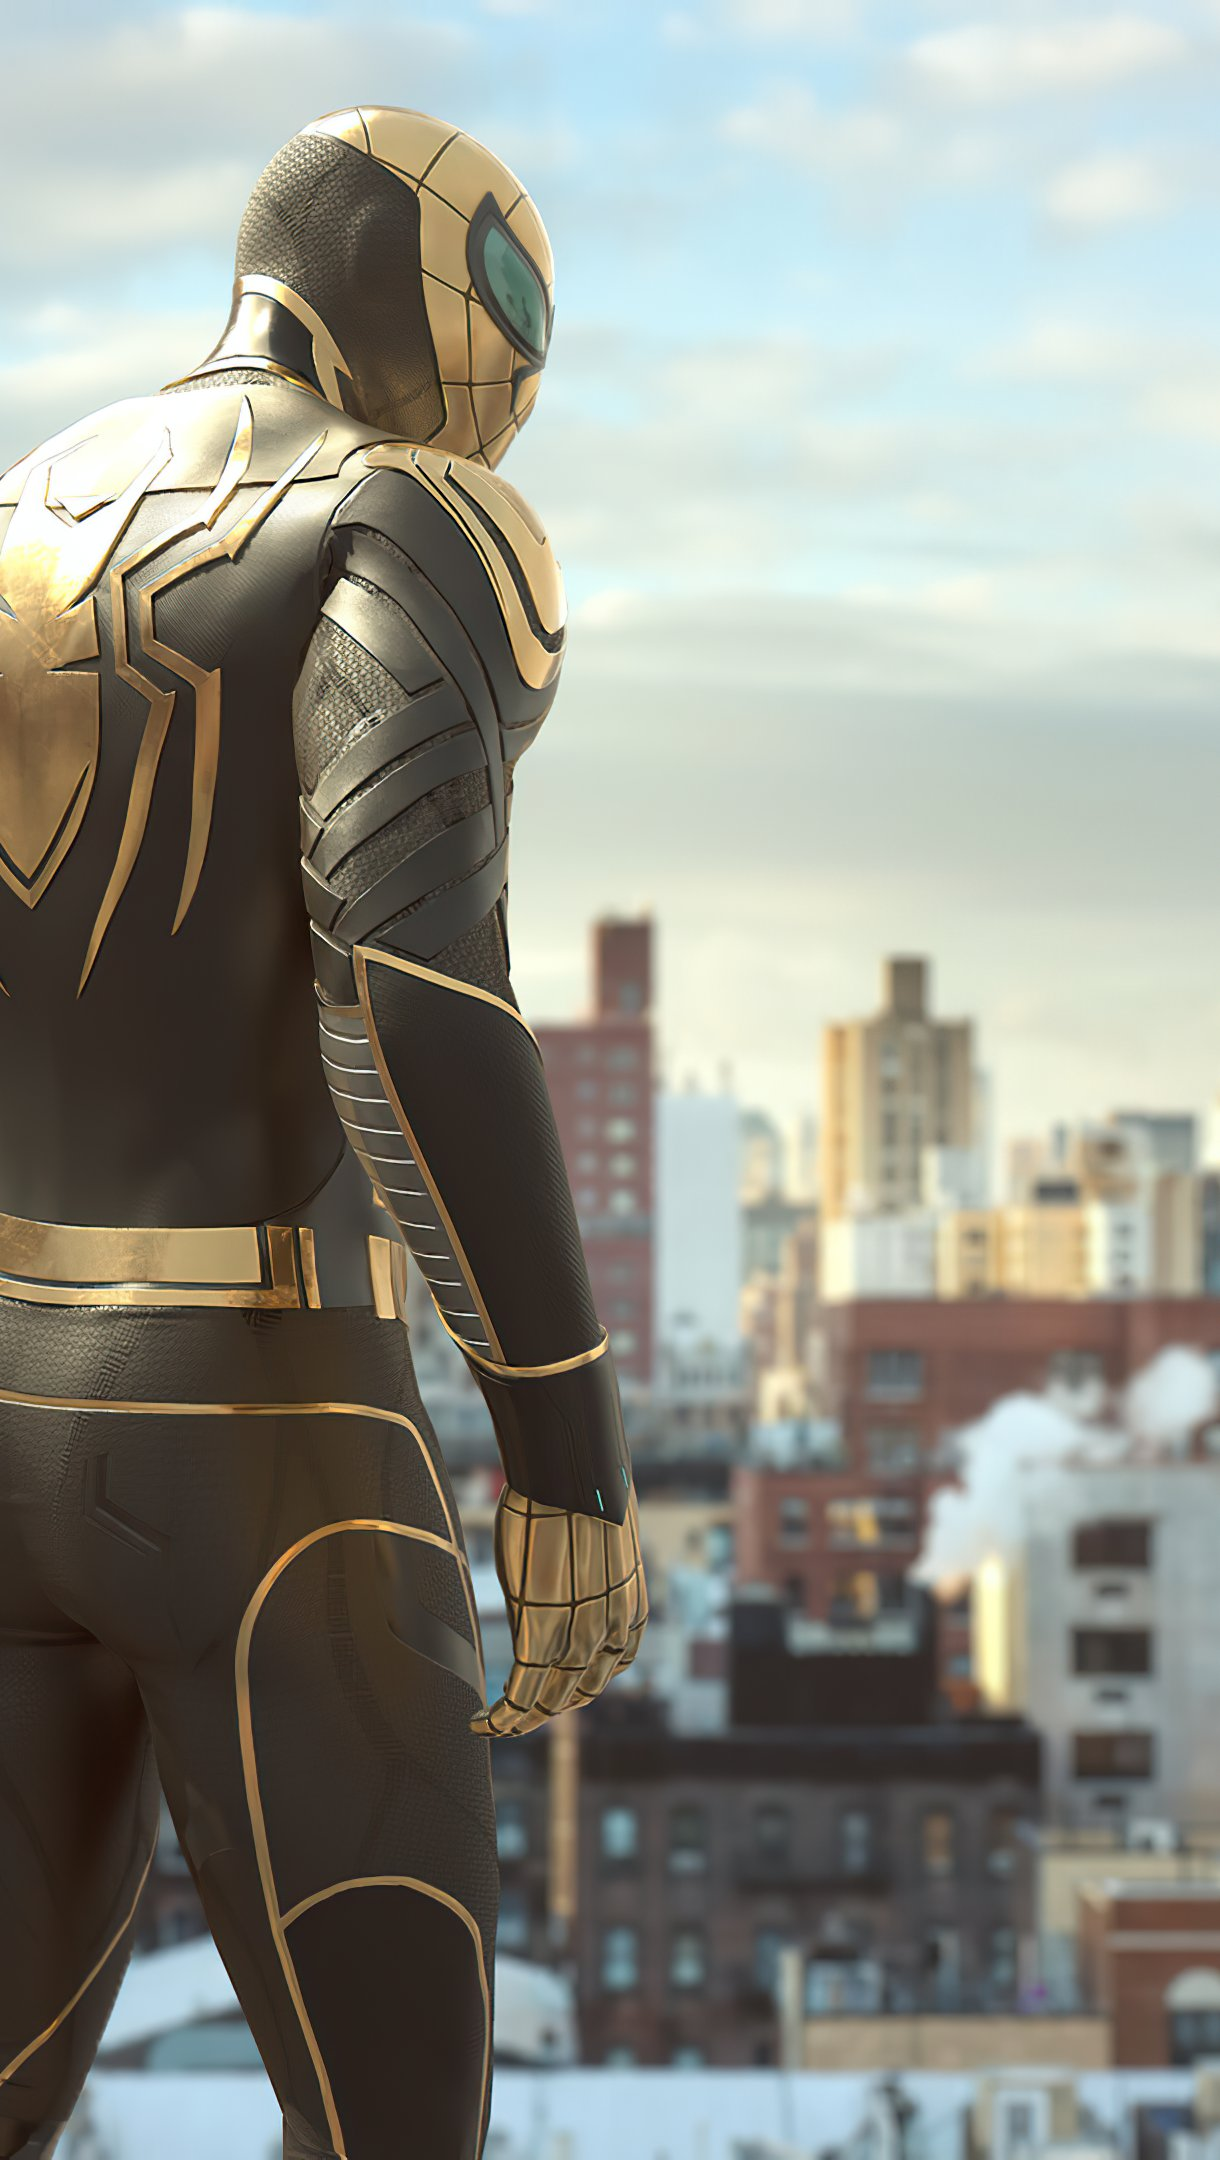 Fondos de pantalla El hombre de araña con Armadura de Wakanda Vertical